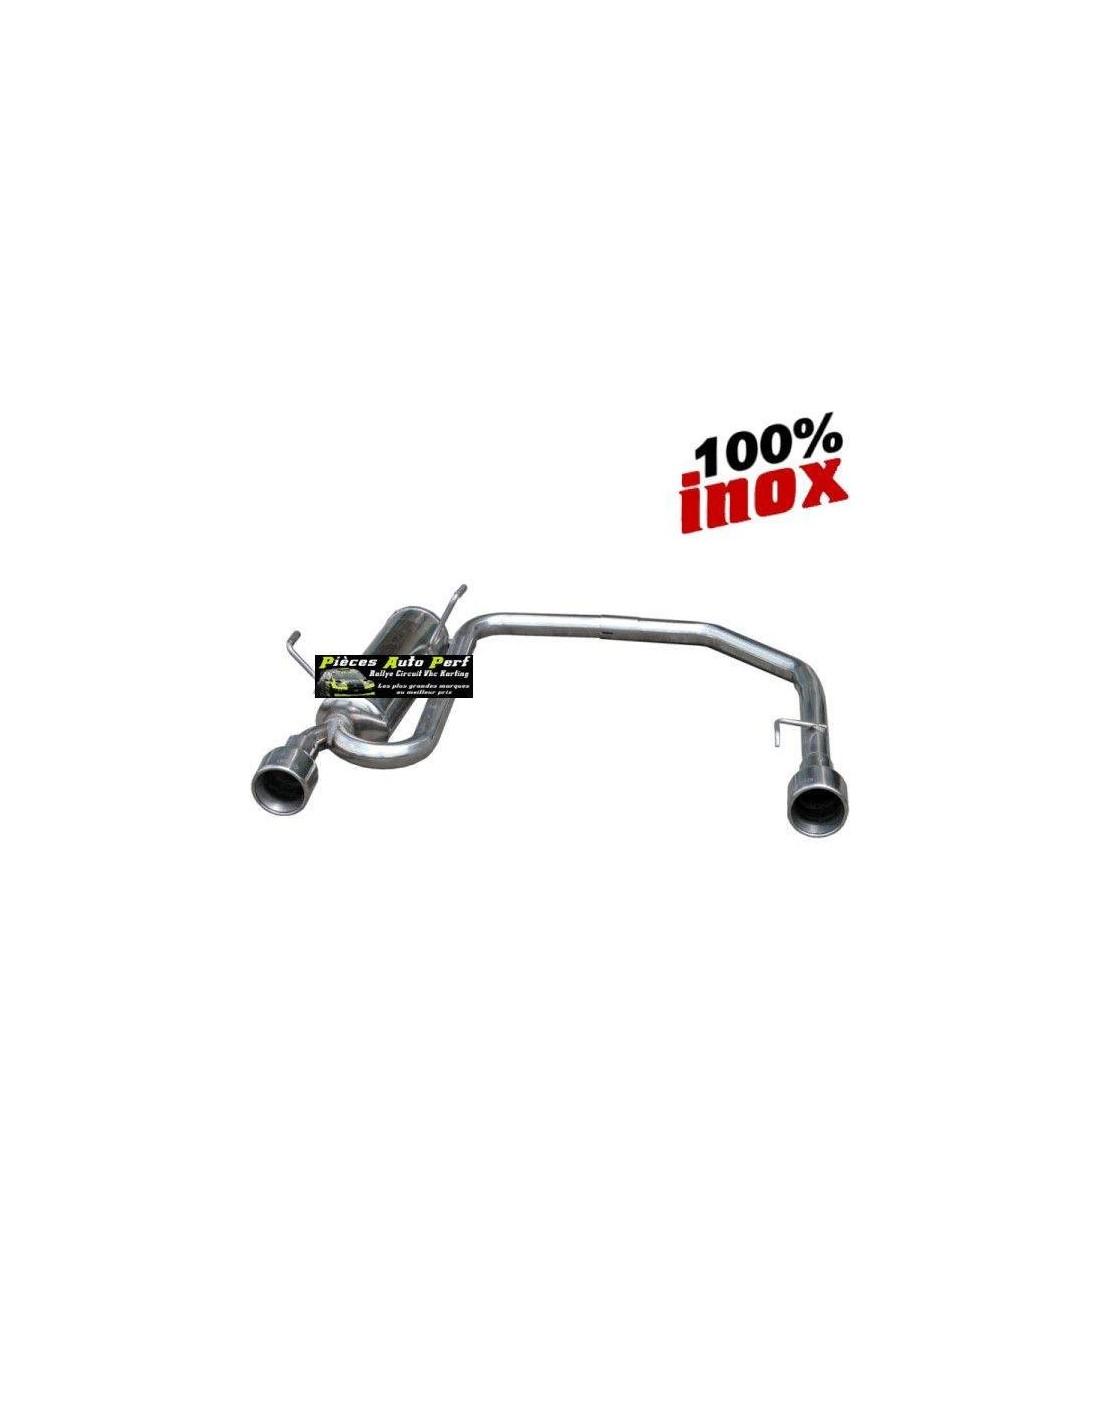 silencieux duplex inox 1 sortie ronde d g 102mm volkswagen golf 4 1l8 20v. Black Bedroom Furniture Sets. Home Design Ideas